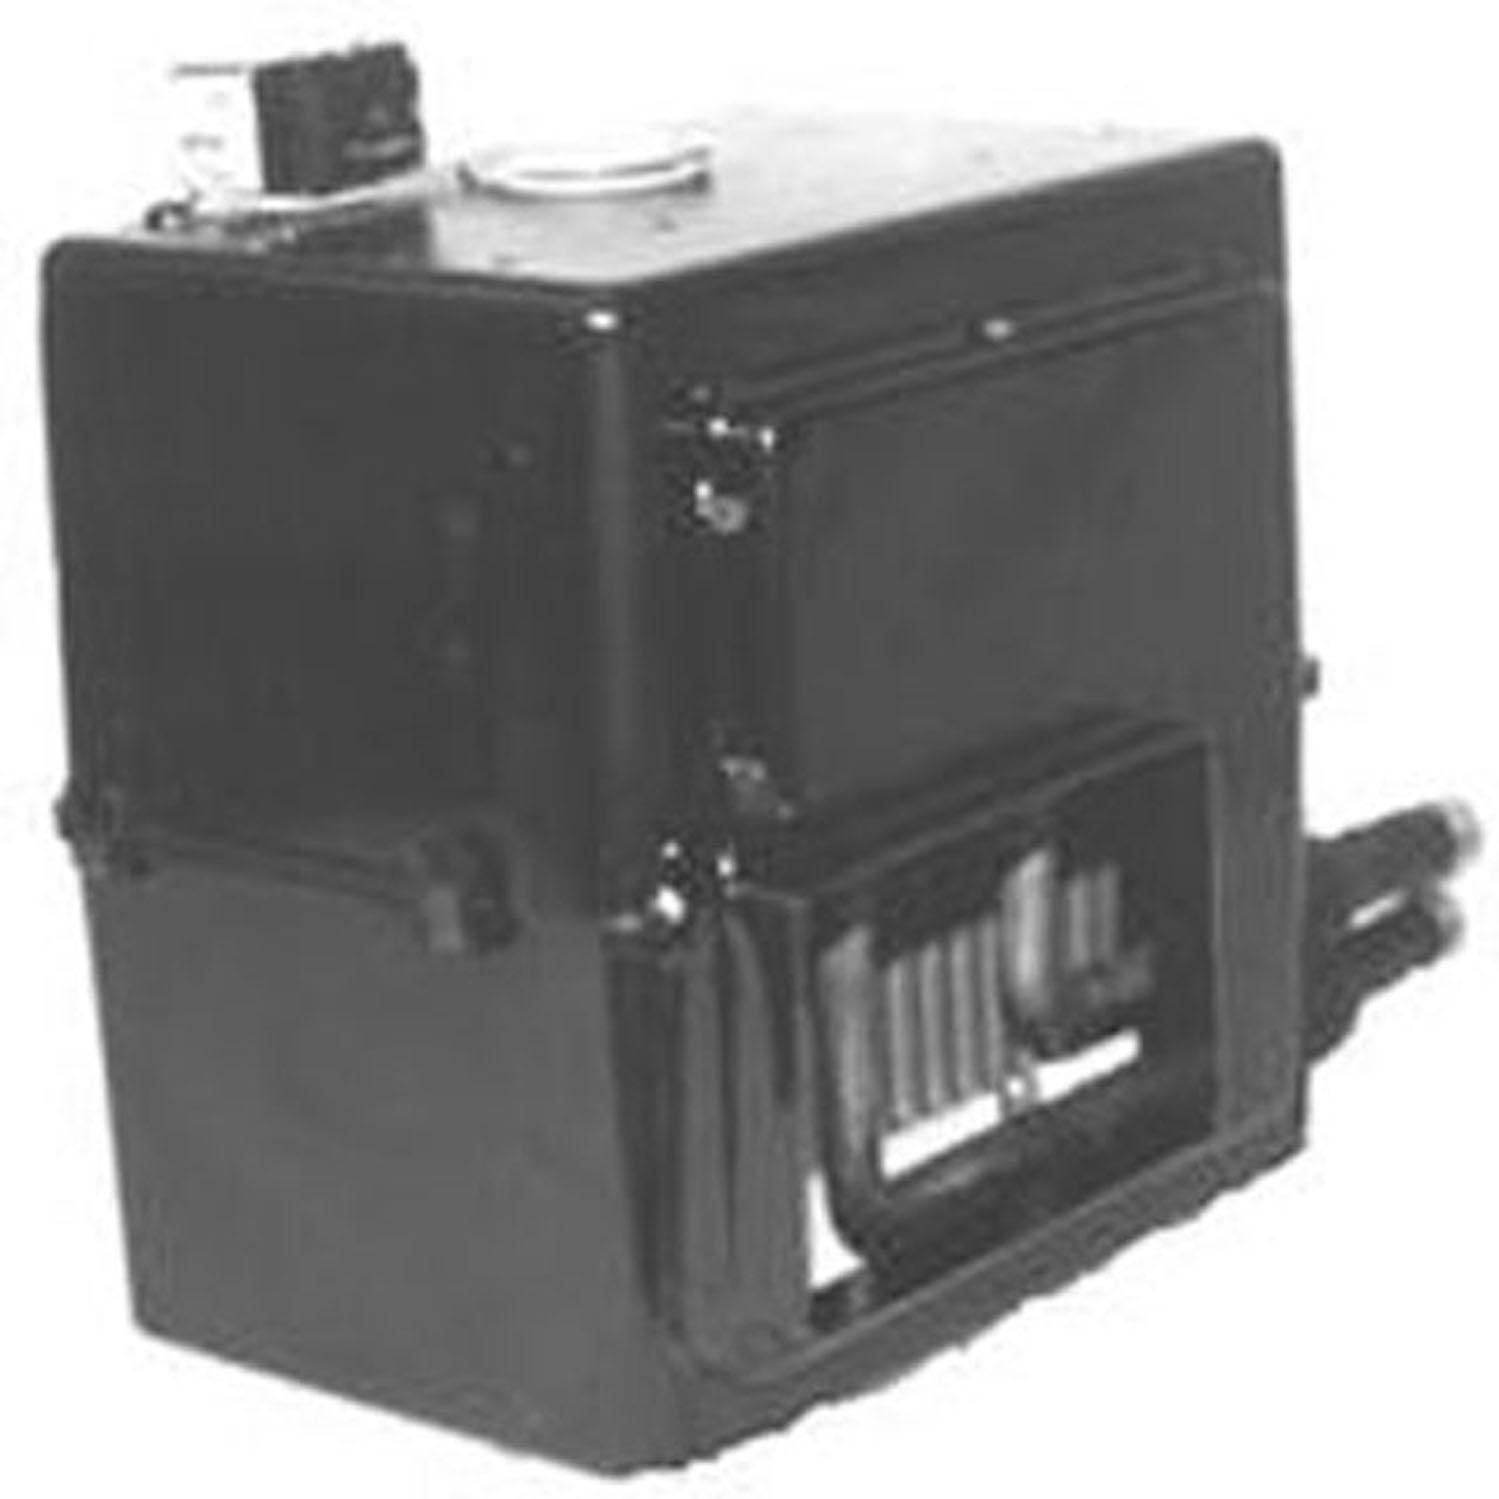 Evaporator Assembly MAZ B2200 93-87